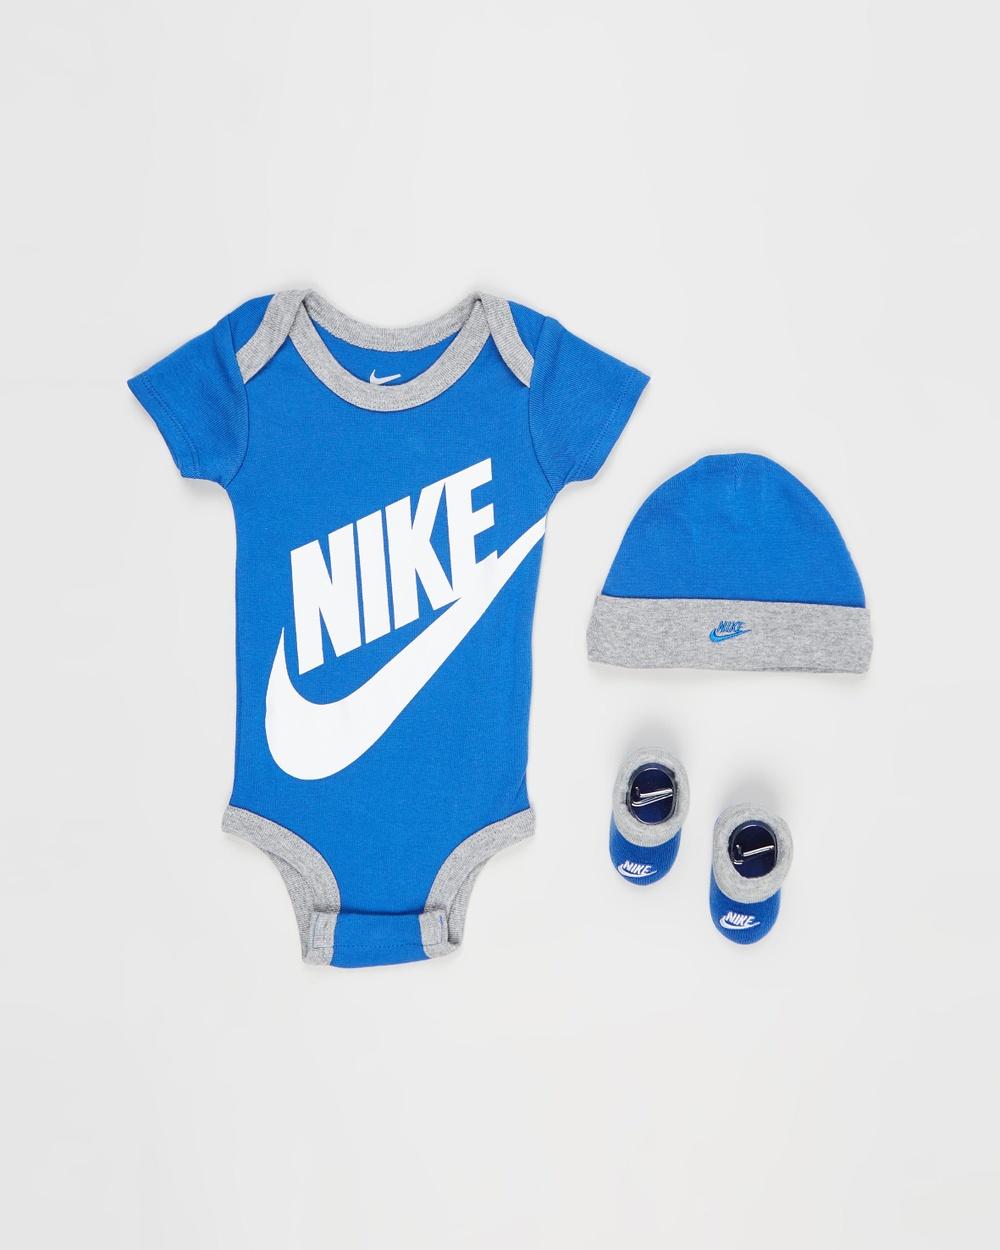 Nike Futura Three Piece Bodysuit, Beanie & Booties Set Babies Headwear Game Royal Three-Piece